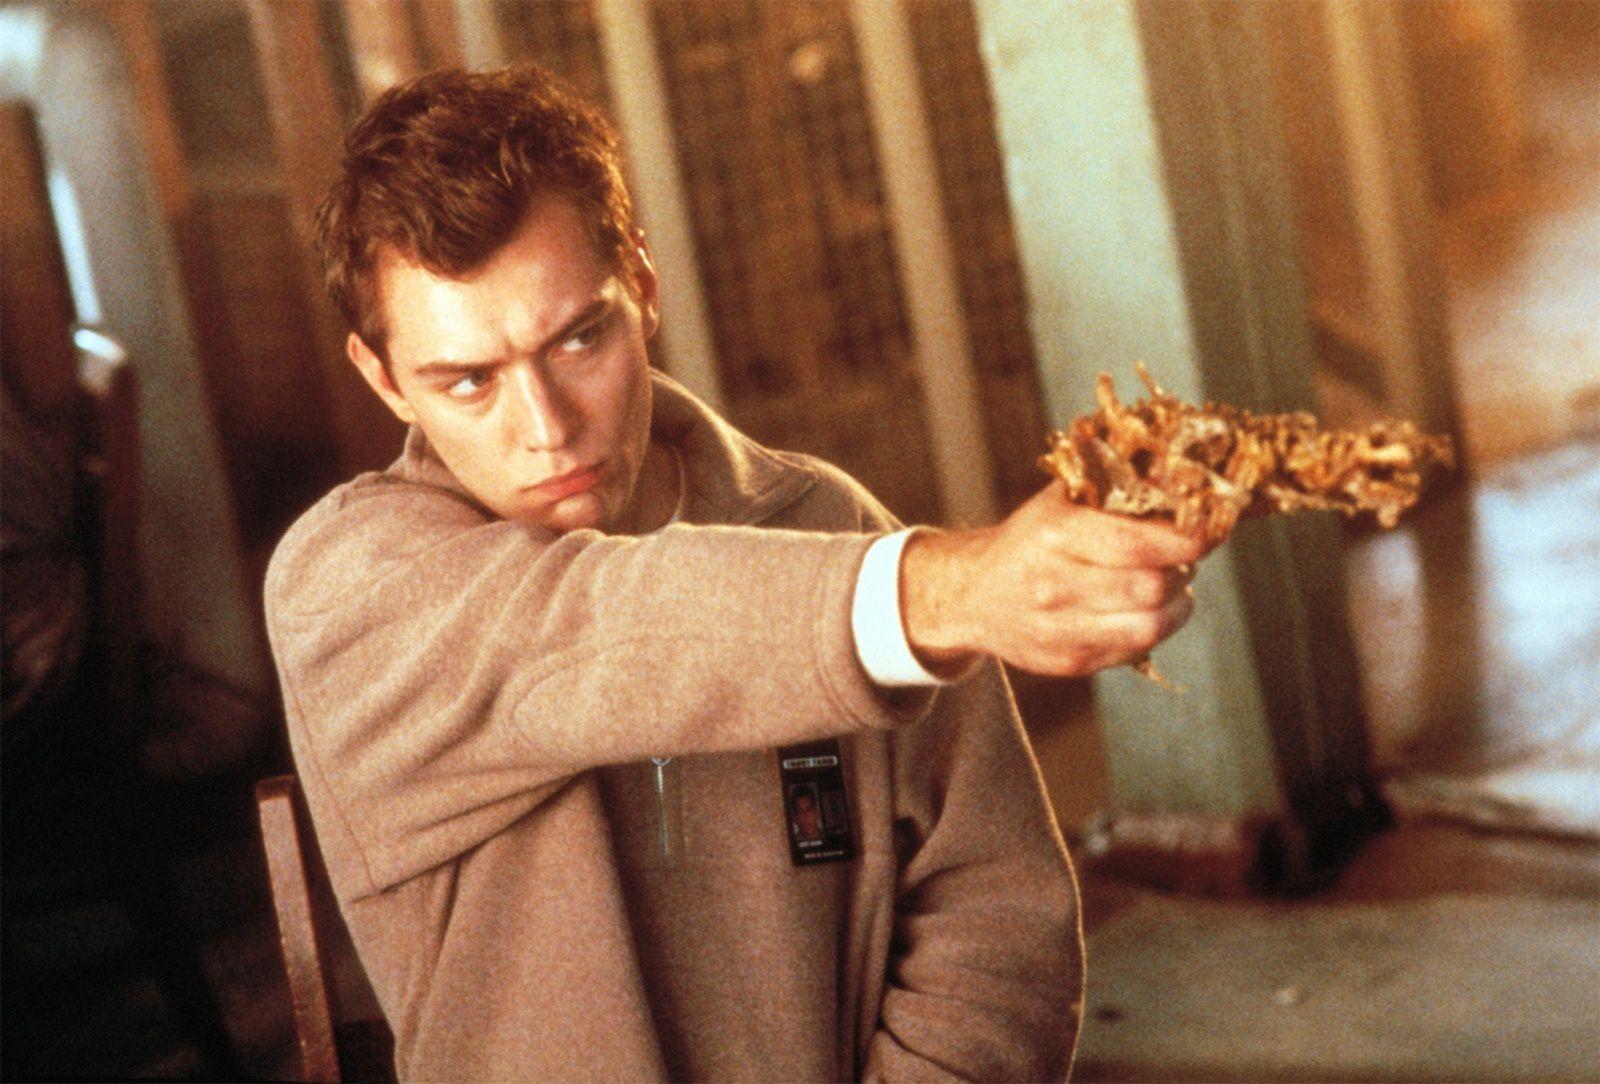 Photogramme du film eXistenZ de David Cronenberg (1999)